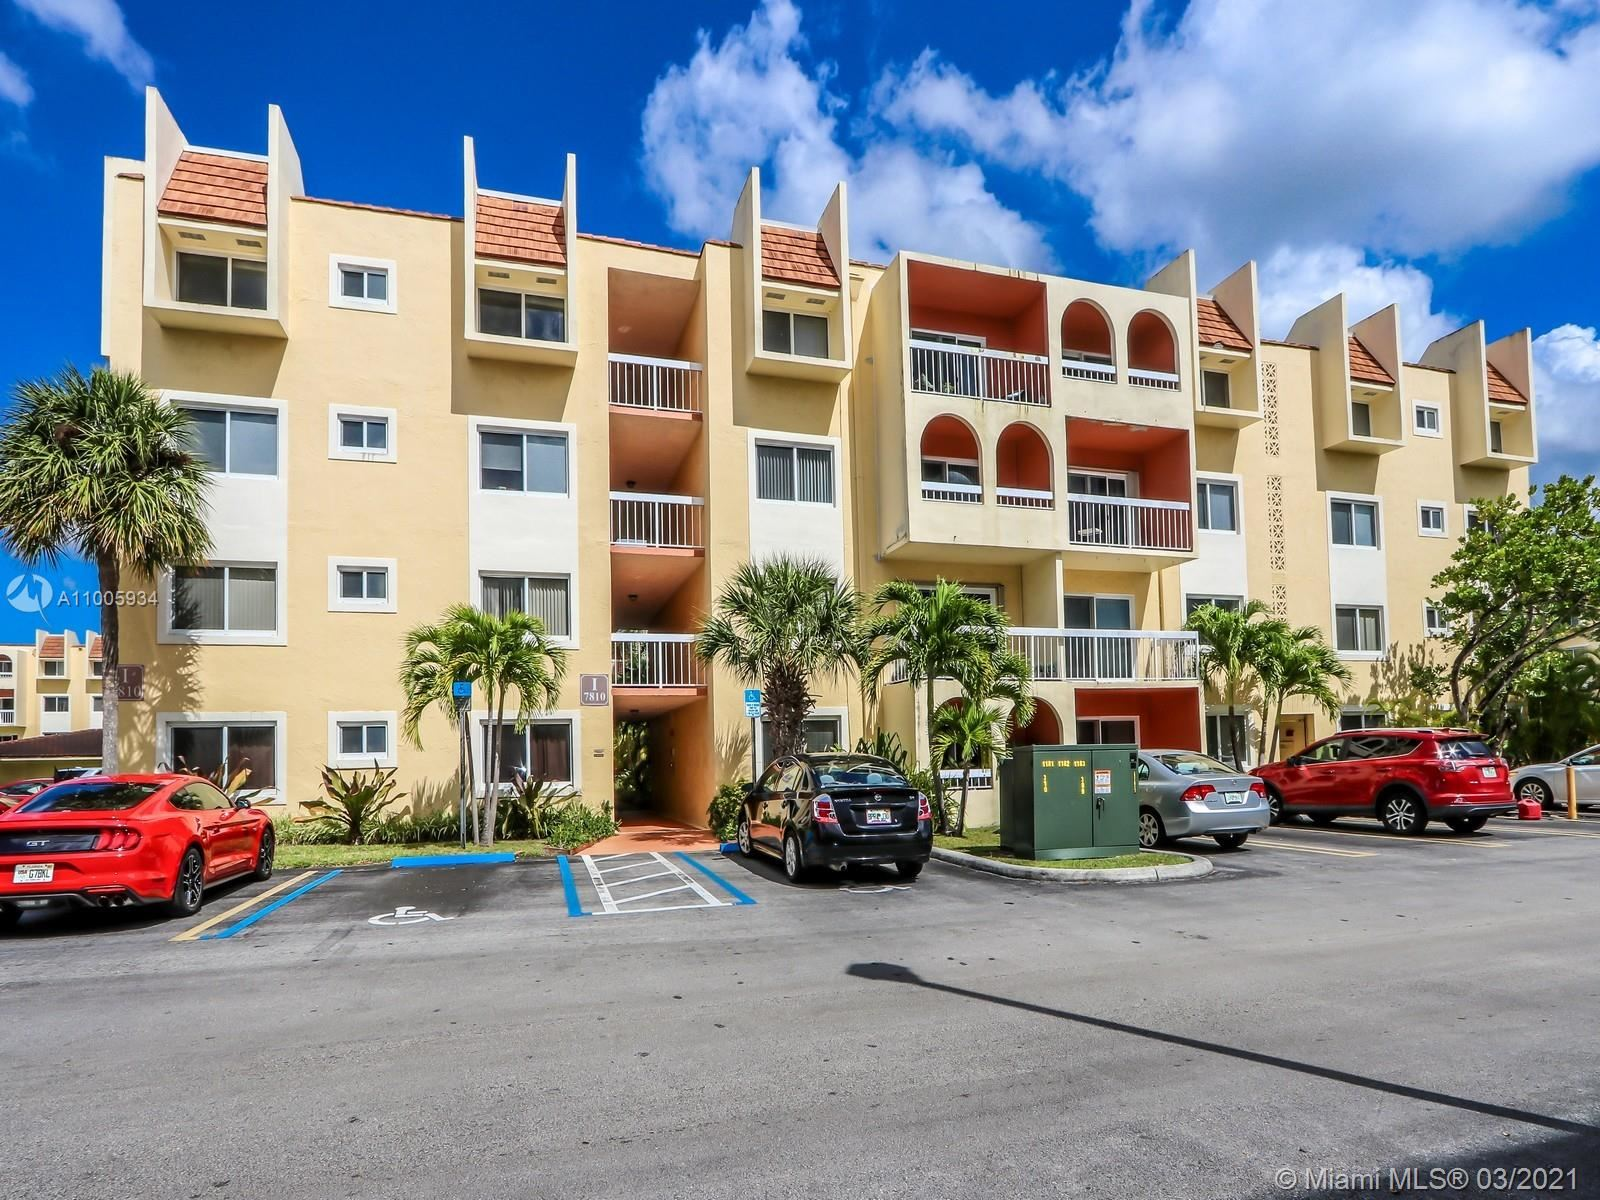 7810 Camino Real #I-410, Miami, FL 33143 - #: A11005934